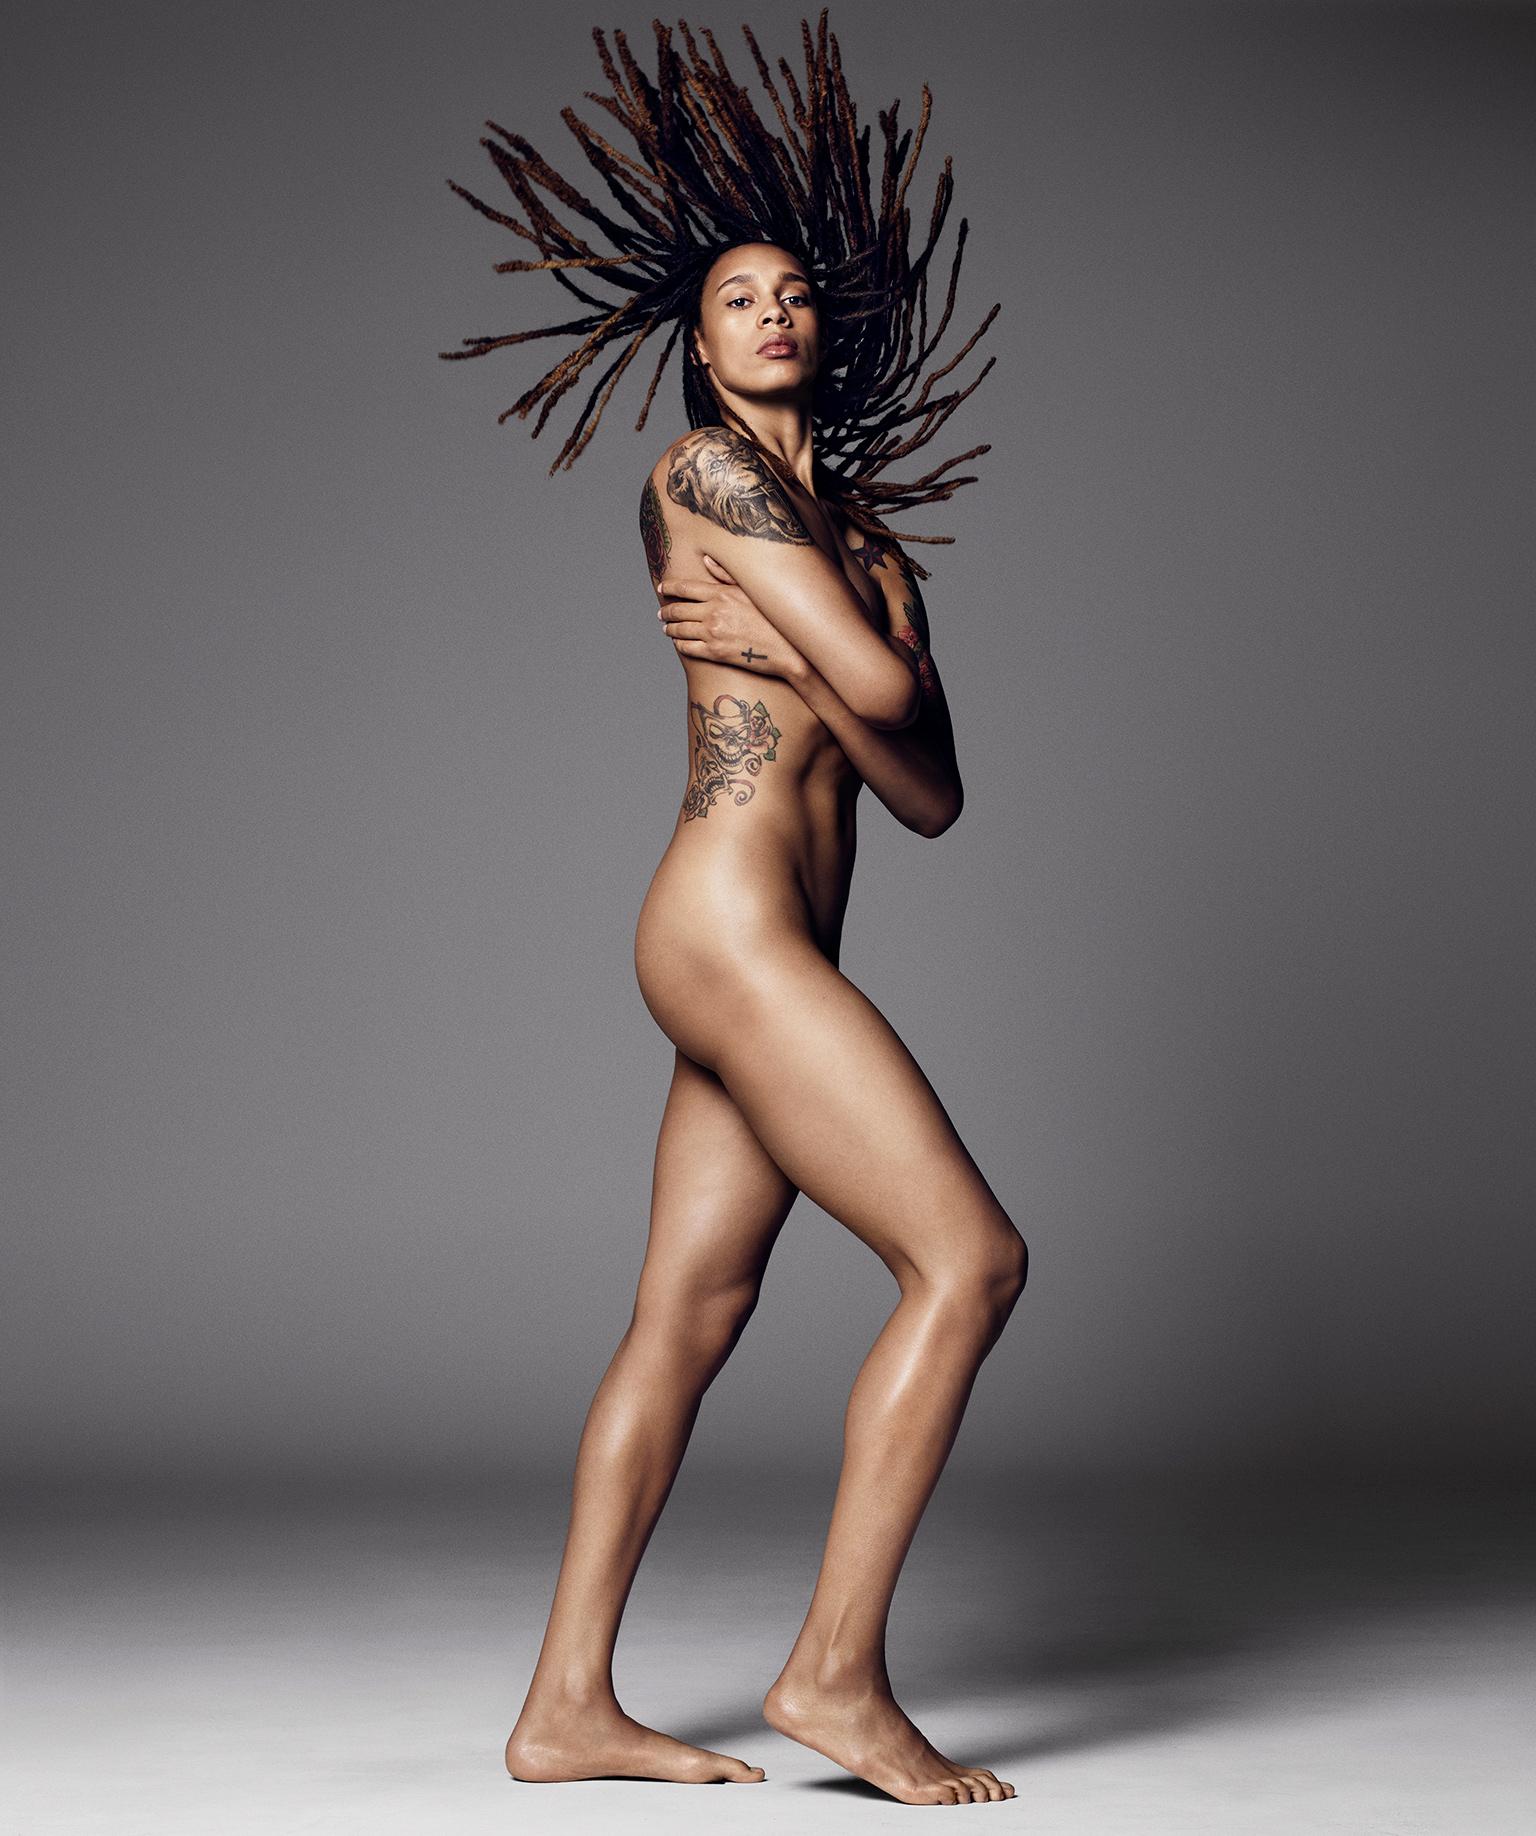 Top female athletes nude